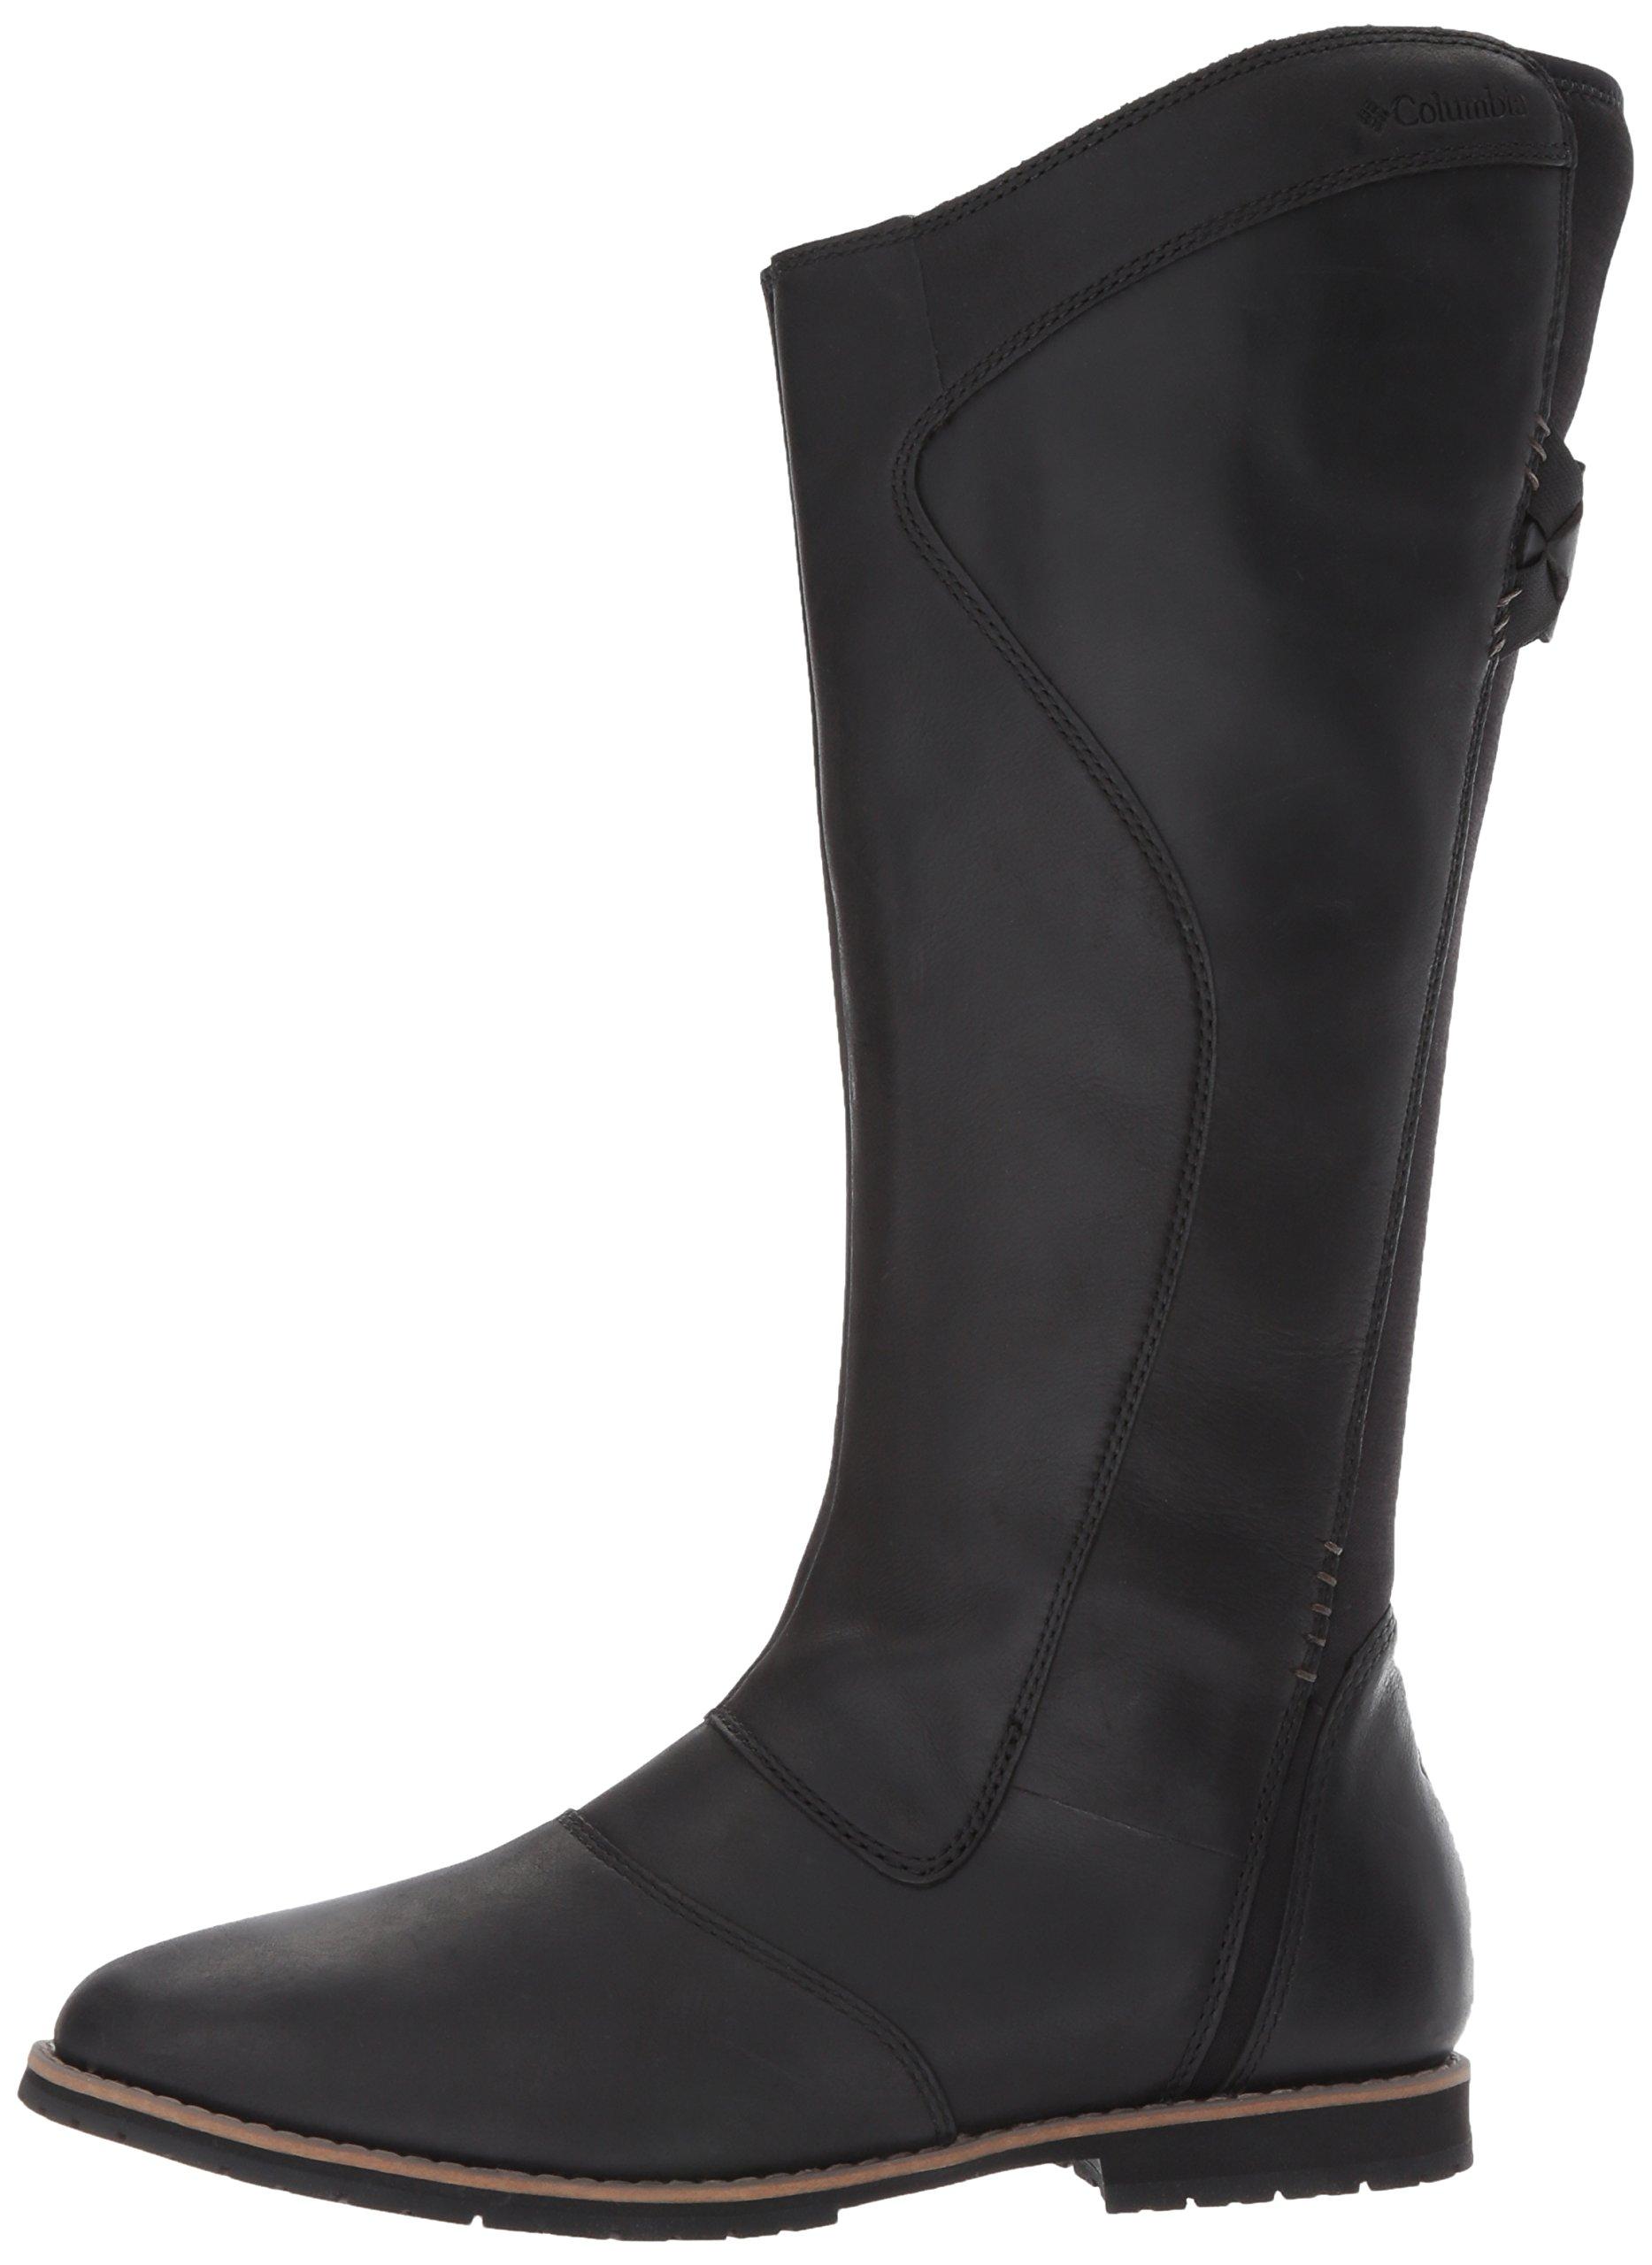 Columbia Women's Twentythird Ave Waterproof Tall Boot Uniform Dress Shoe, Black, Mud, 9 B US by Columbia (Image #5)